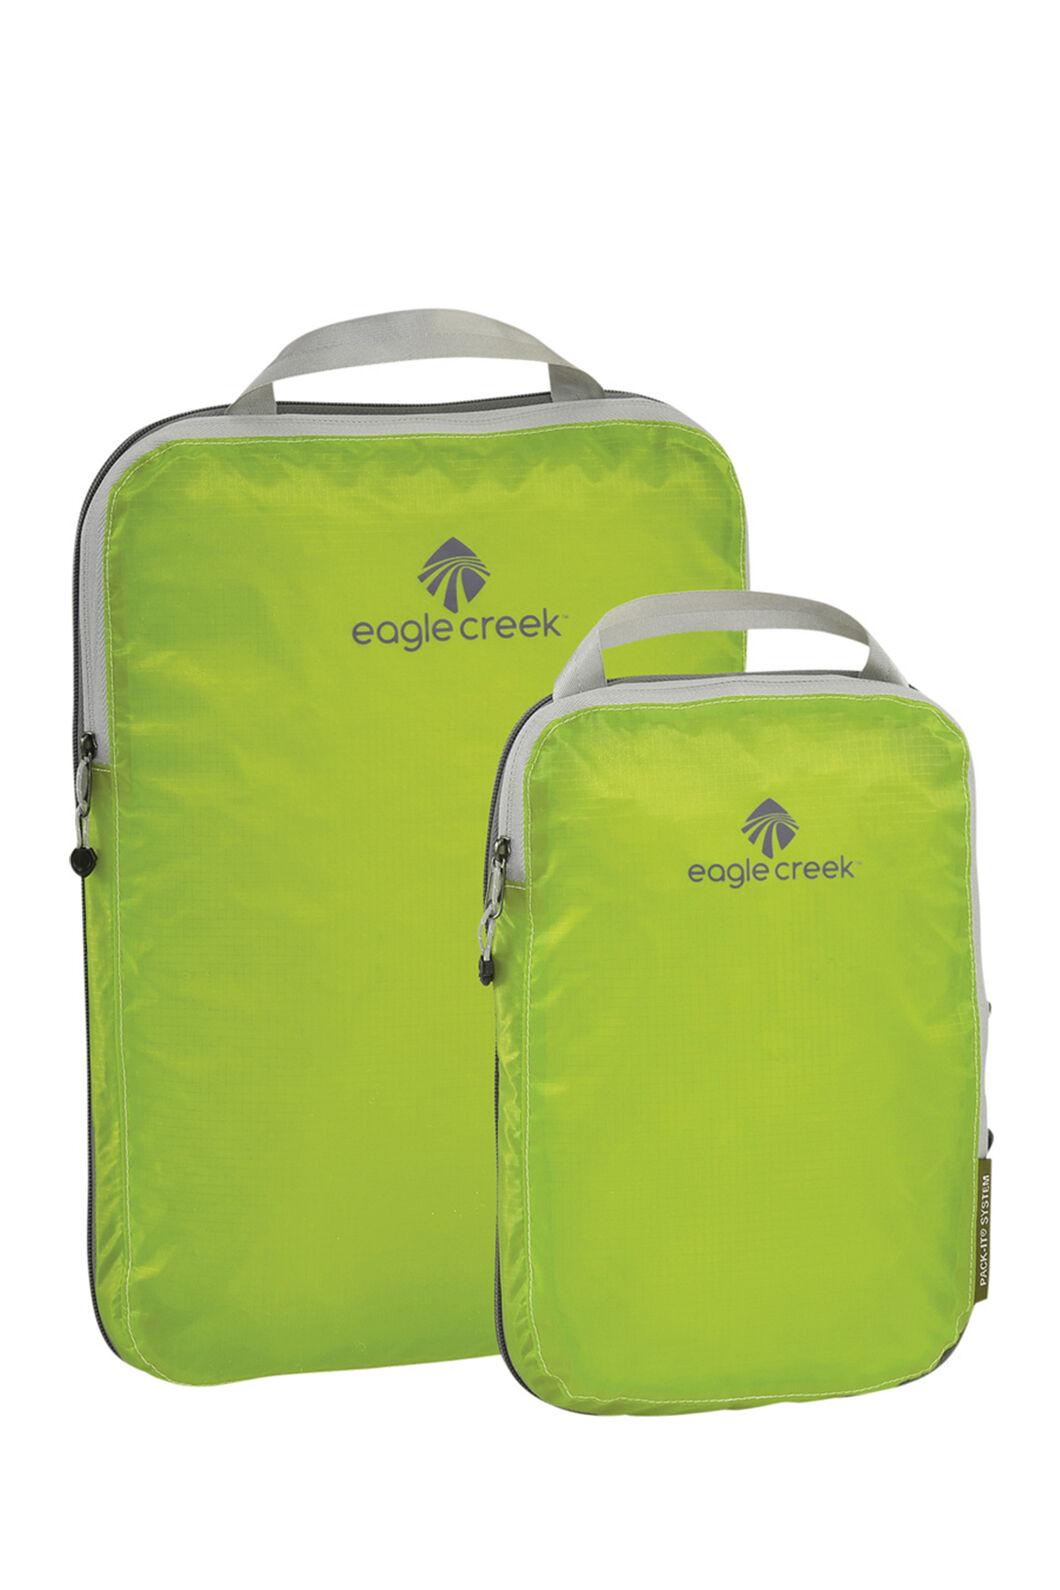 Eagle Creek Pack-It Specter Compression Cube Set, STROBE GREEN, hi-res